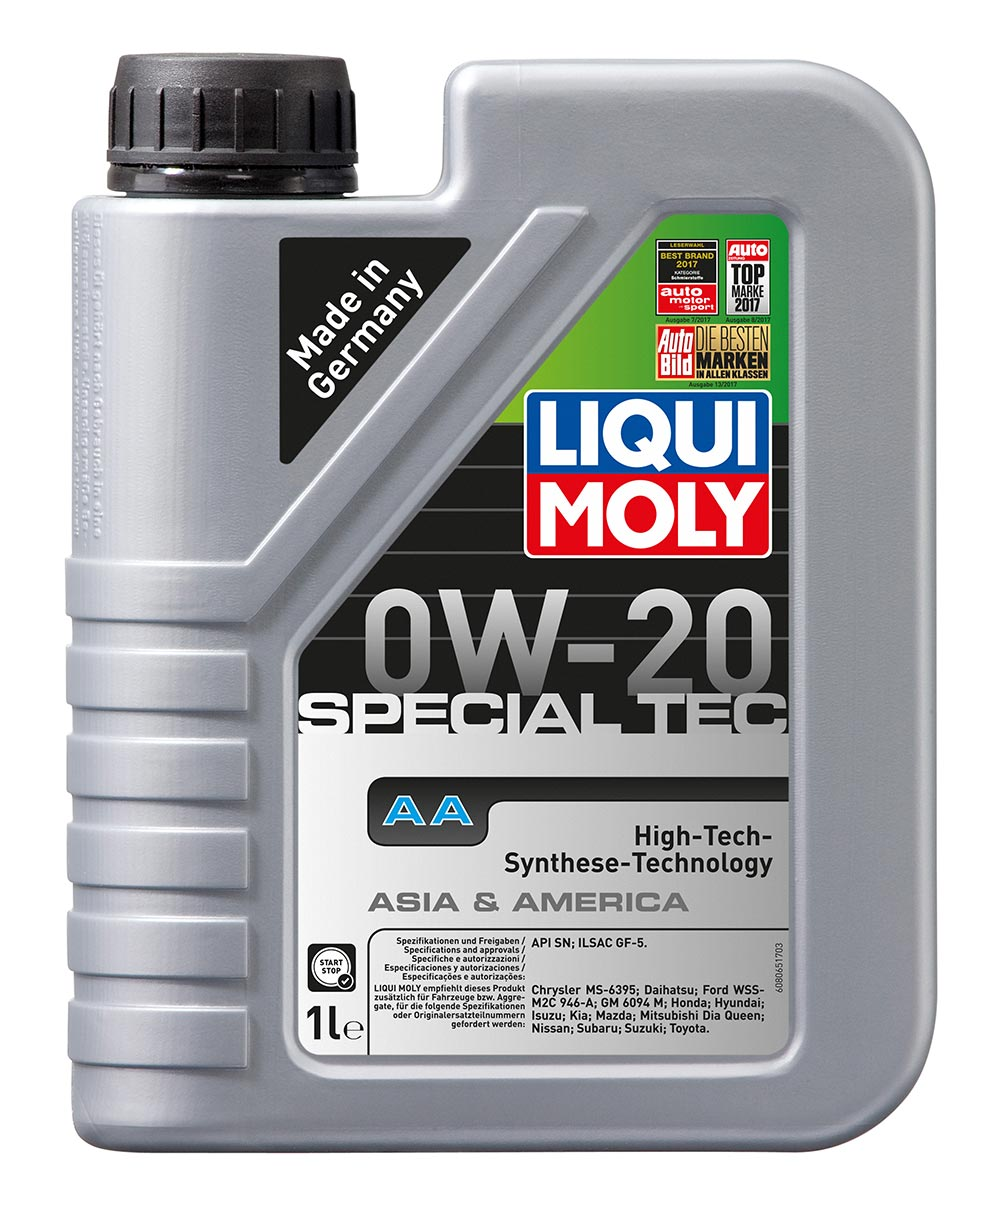 Масло моторное синт. 0W20 Special Tec AA 1л API SN. ILSAC GF 5/Ford M2C 946-A. S